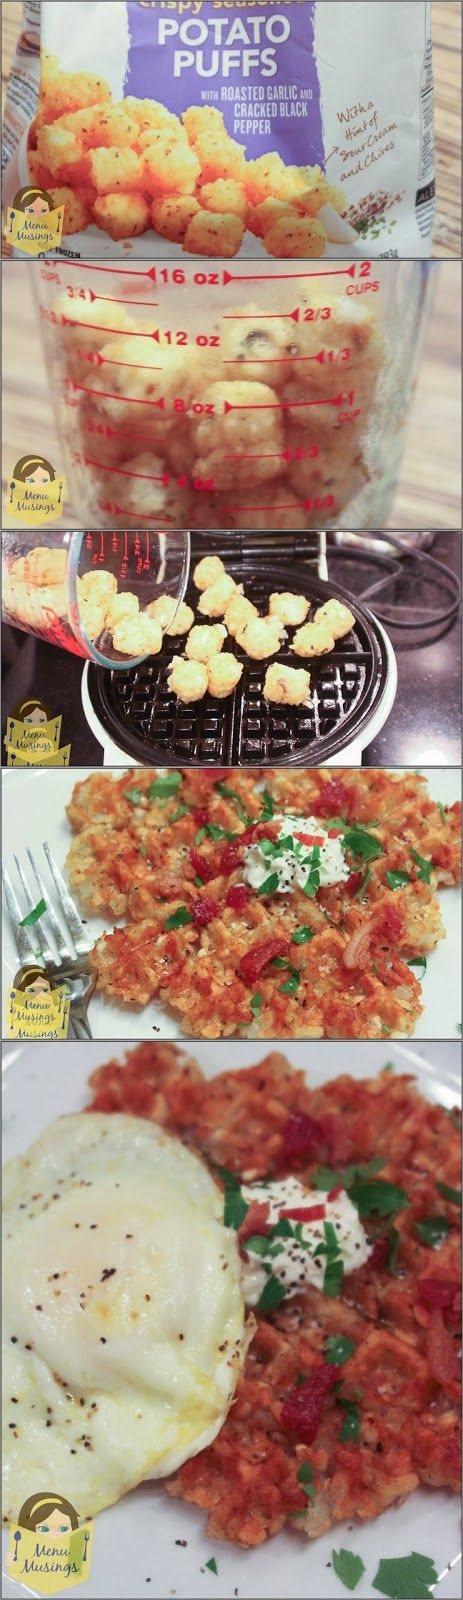 Menu Musings of a Modern American Mom: Waffle Iron Tater Tot Hash Browns